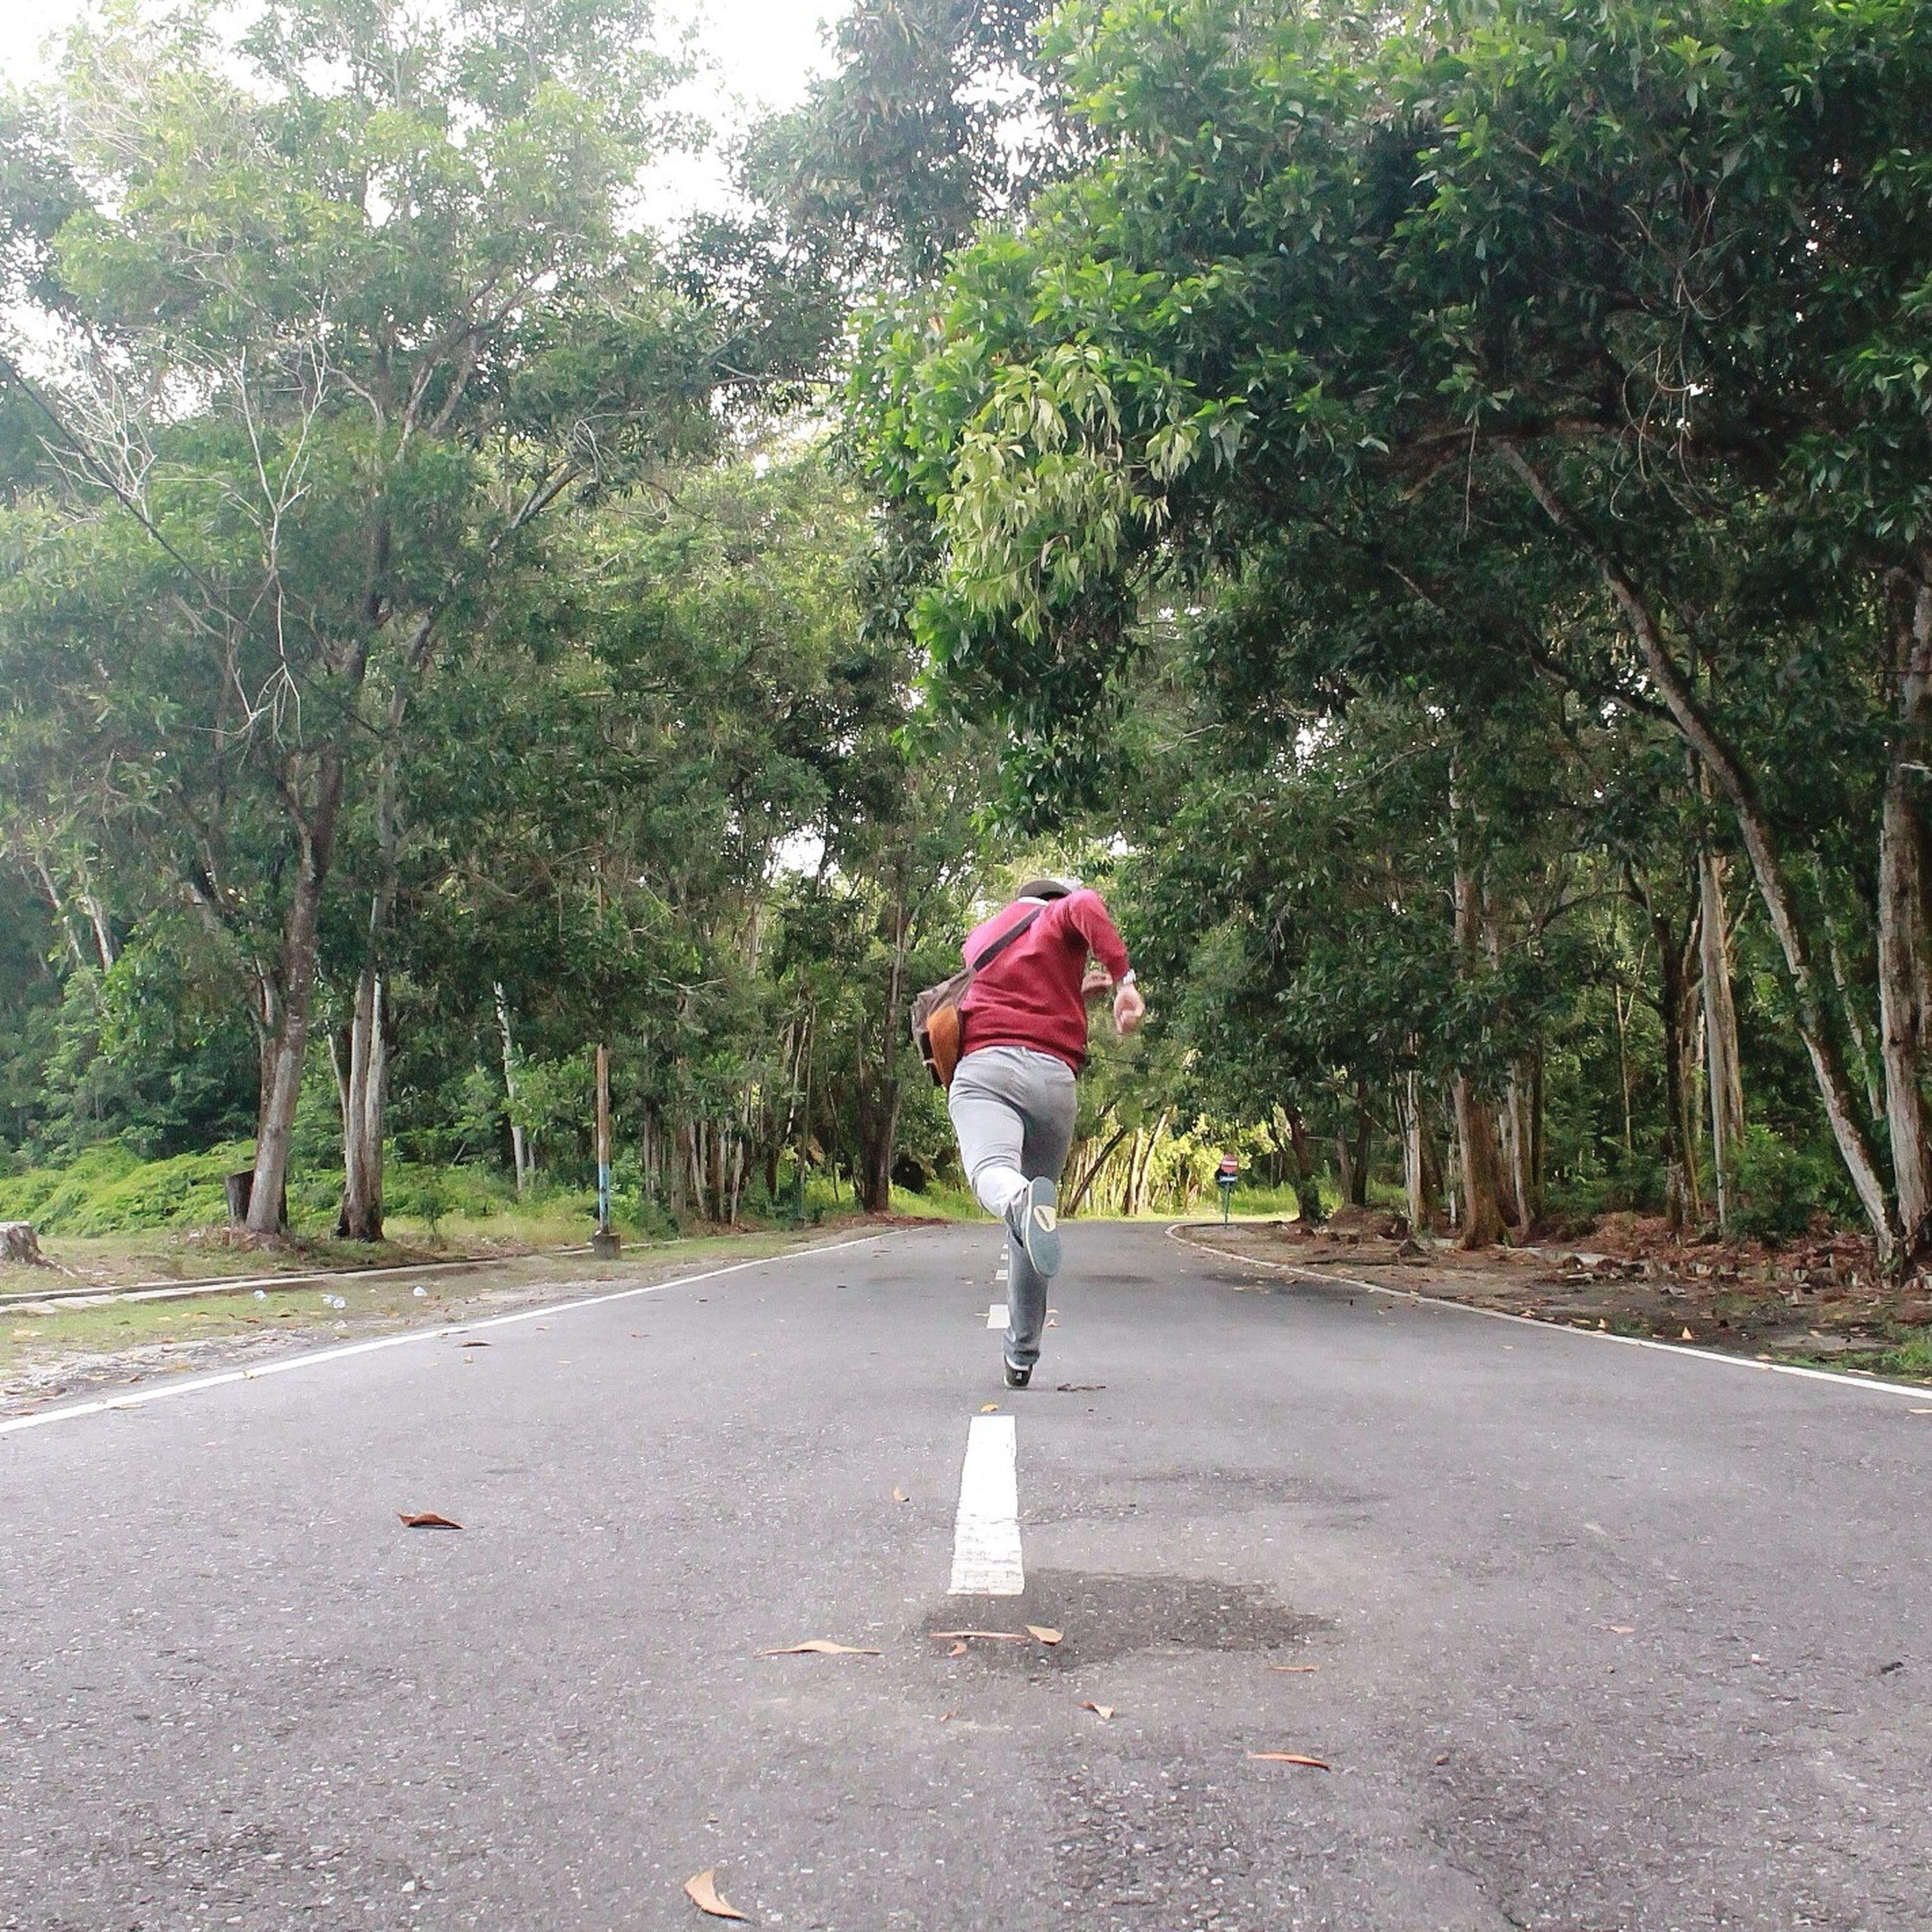 Run🏃 Enjoying Life Spirit EyeEmBestEdits EyeEm Indonesia First Eyeem Photo Creative Speed EyeEm EyeEm Best Shots